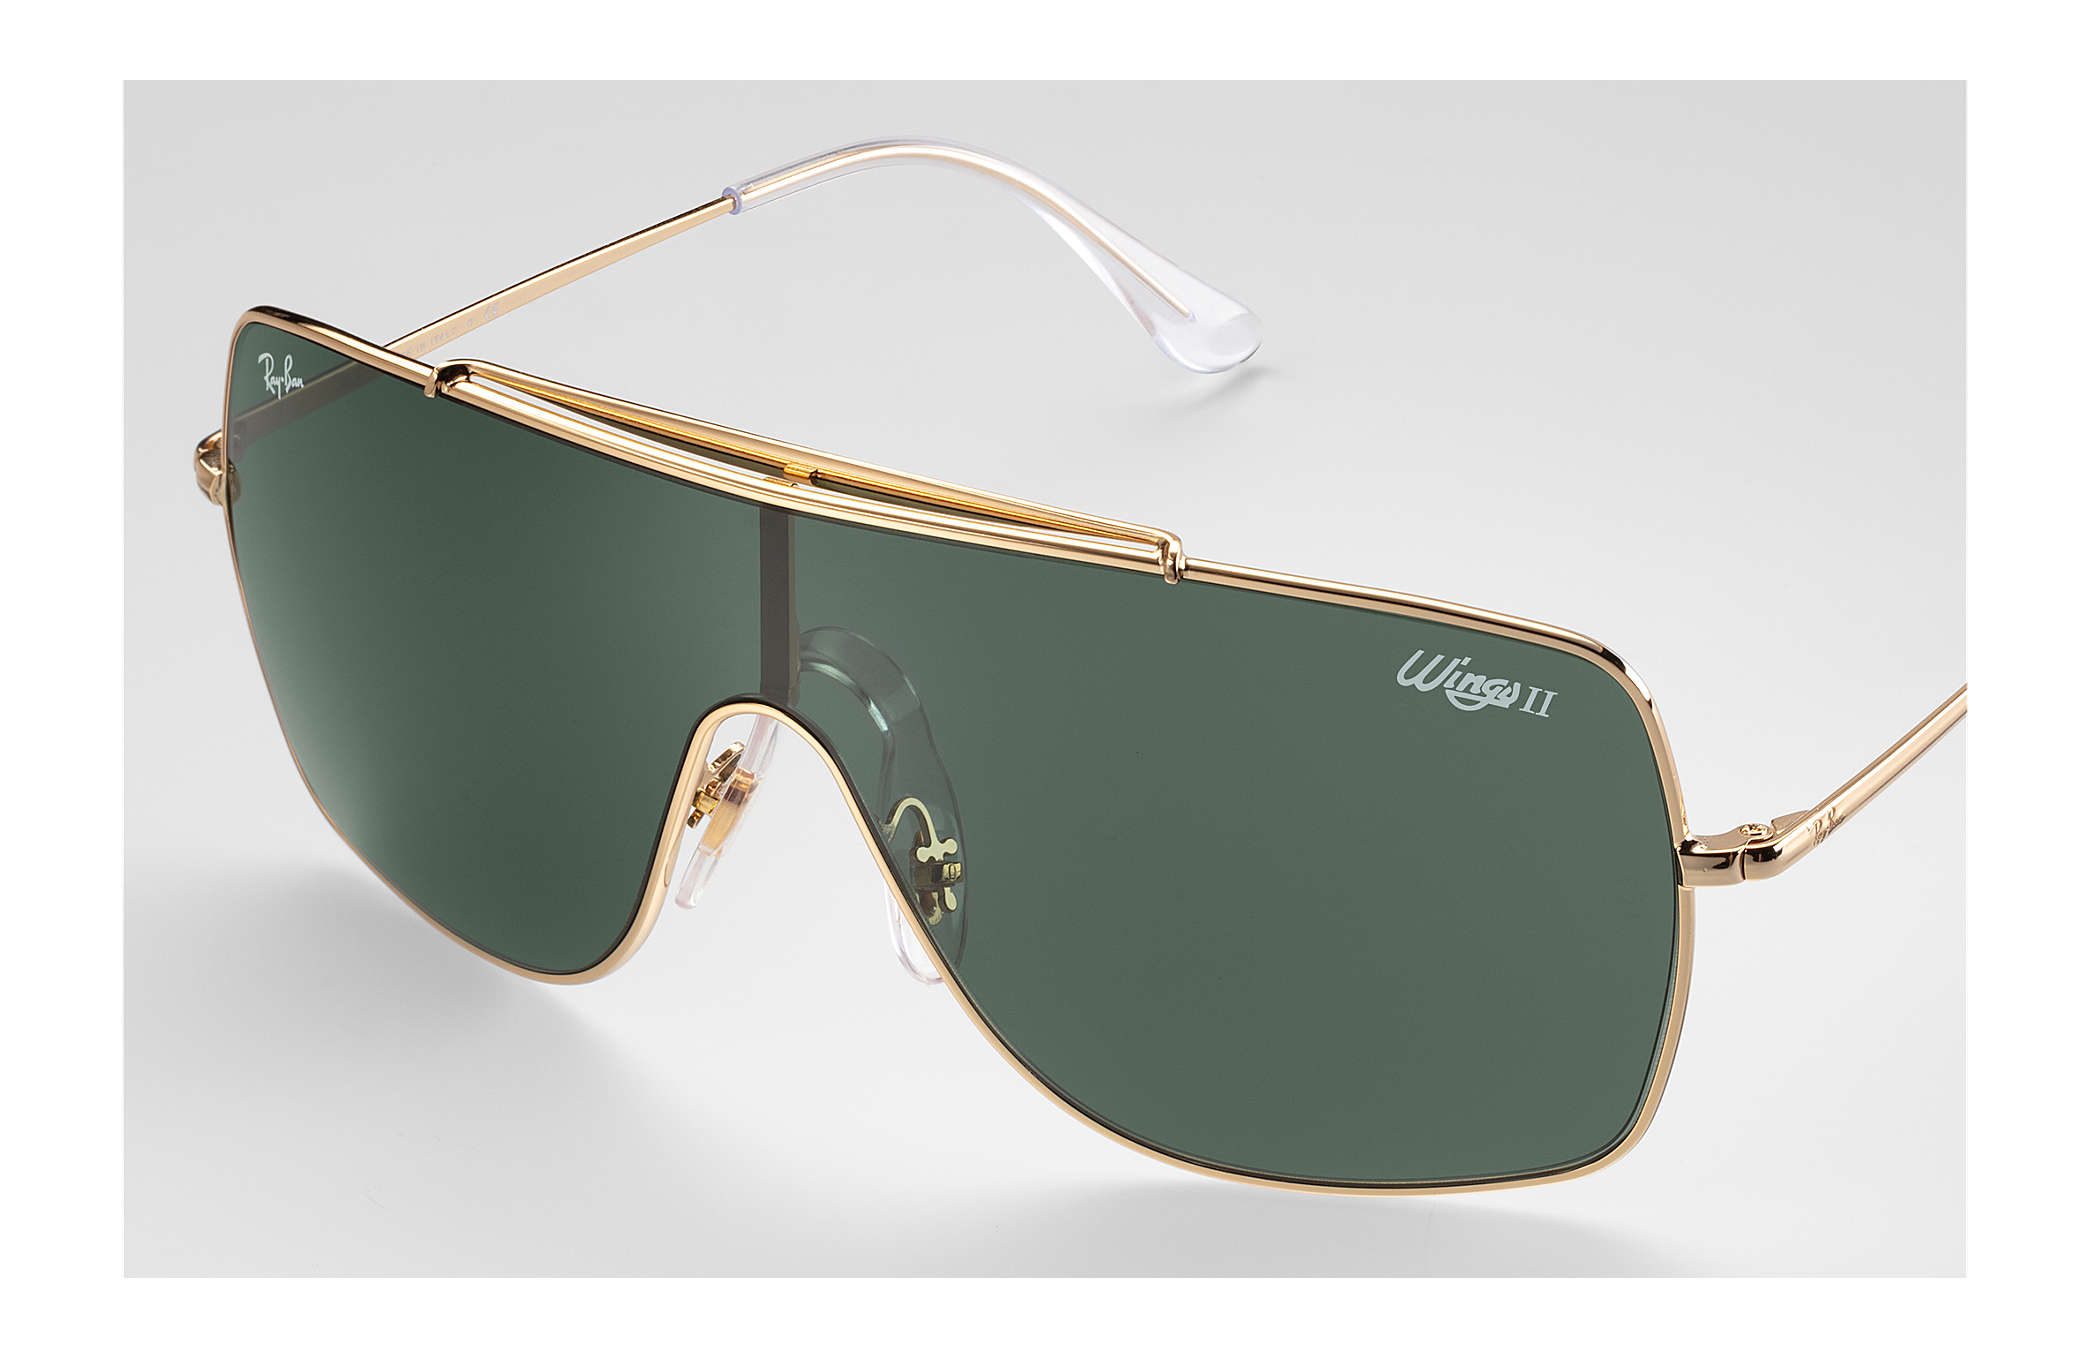 c67cb8ff89 Ray-Ban Wings Ii RB3697 Gold - Metal - Green Lenses ...